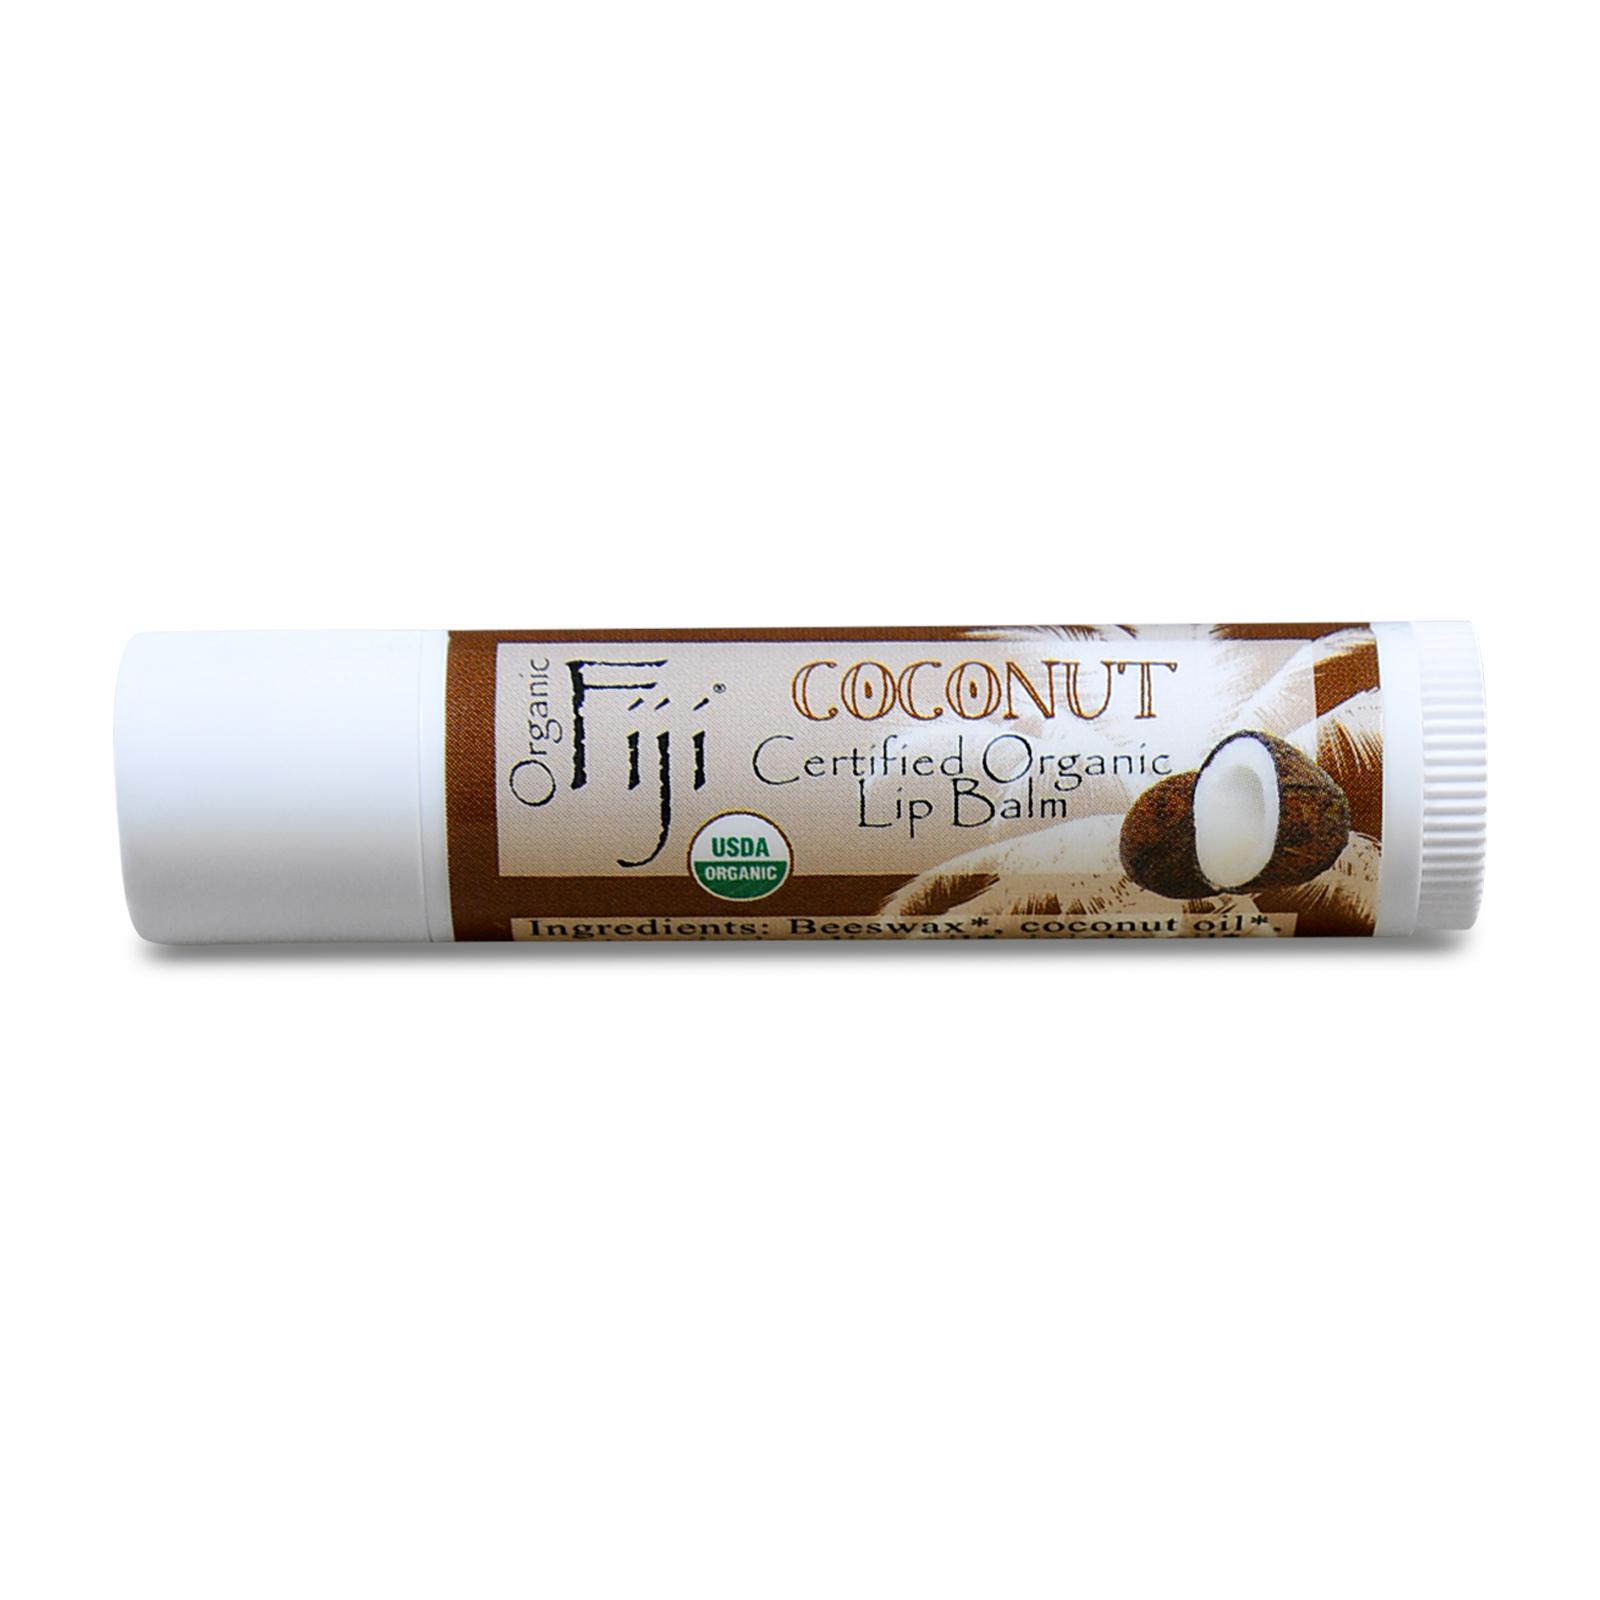 Organic Fiji - Organic Coconut Oil Lip Balm Peppermint - 0.15 oz. (pack of 2) Decleor - Source DEclat Set: Moisturiser + Peel-Off Mask + Night Balm + Aromessence Neroli + Bag - 4pcs+1bag